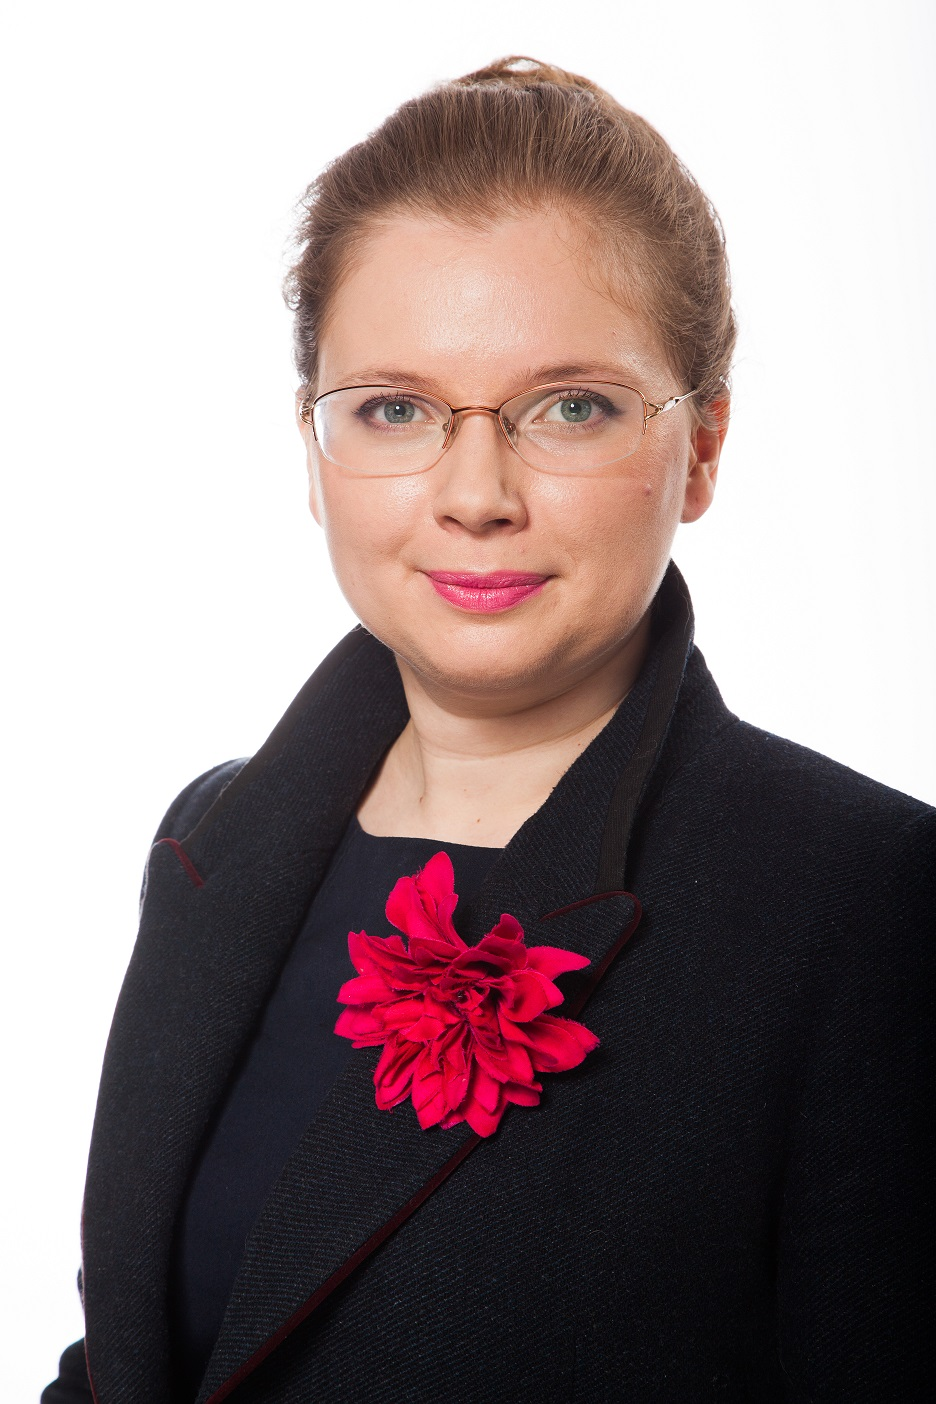 IrinaTikhomirova1